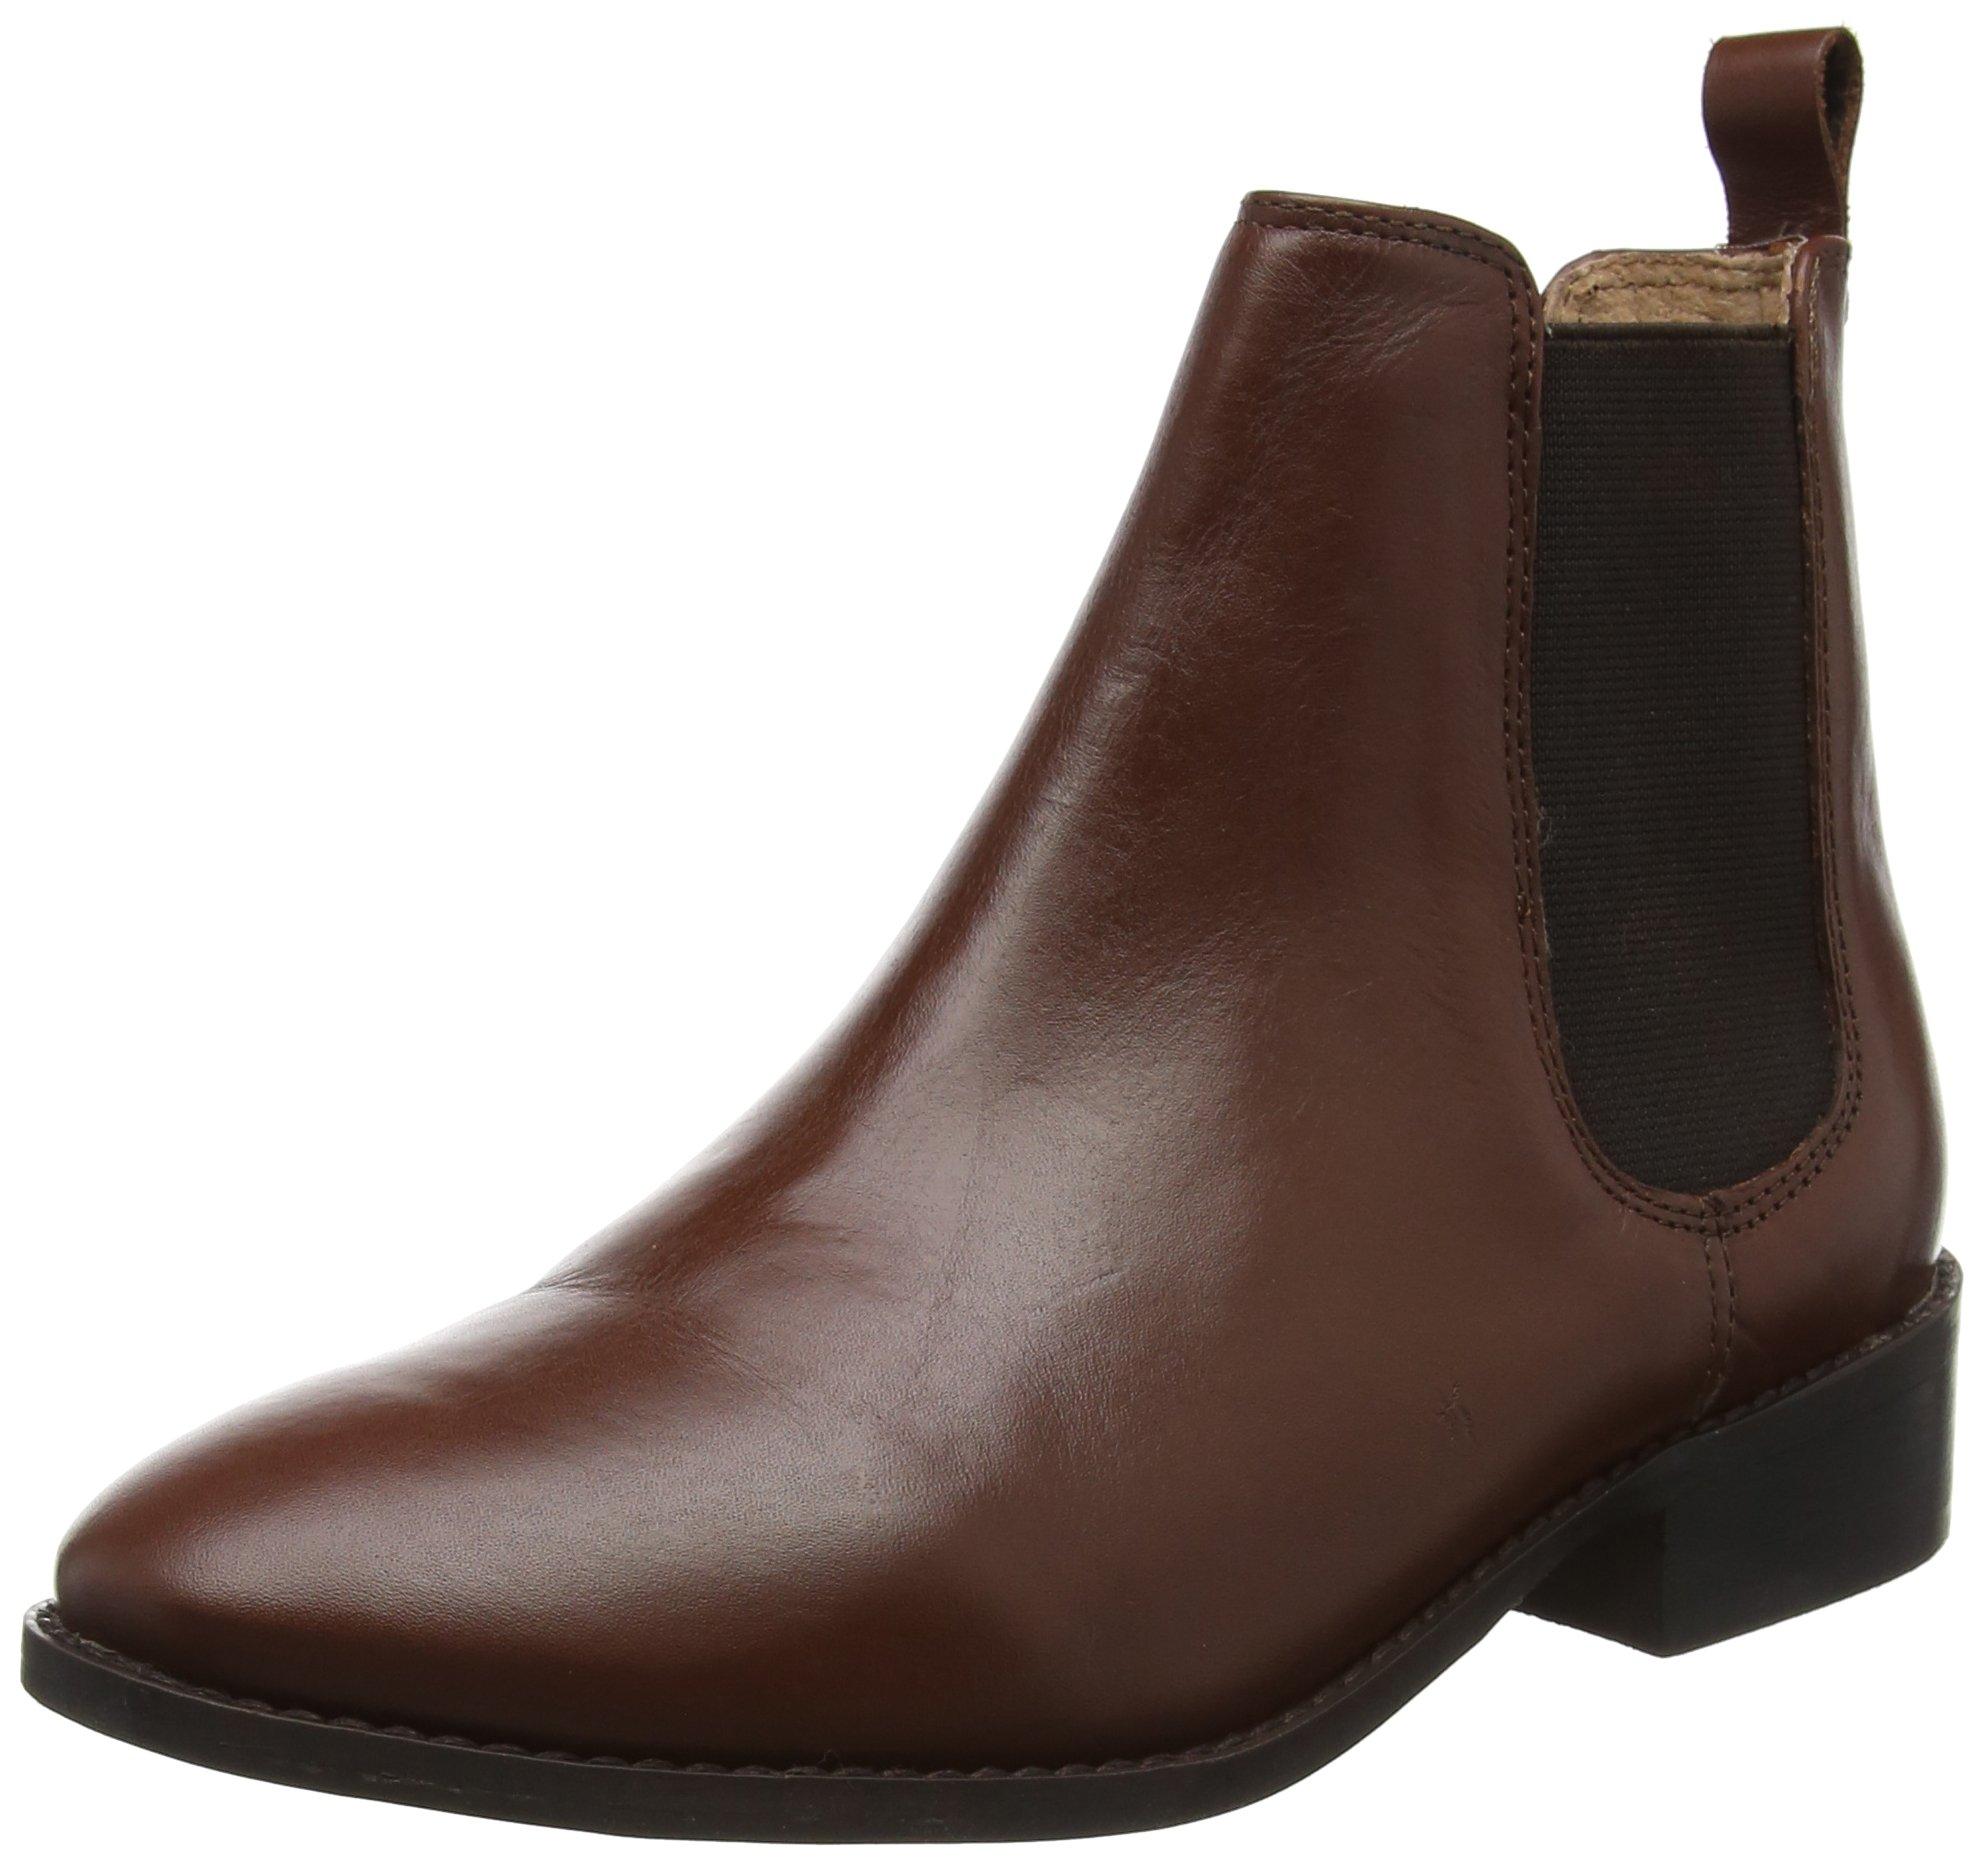 Eu Boots Office FemmeBrownchocolate39 WChelsea Bramble SGLMpqUzV